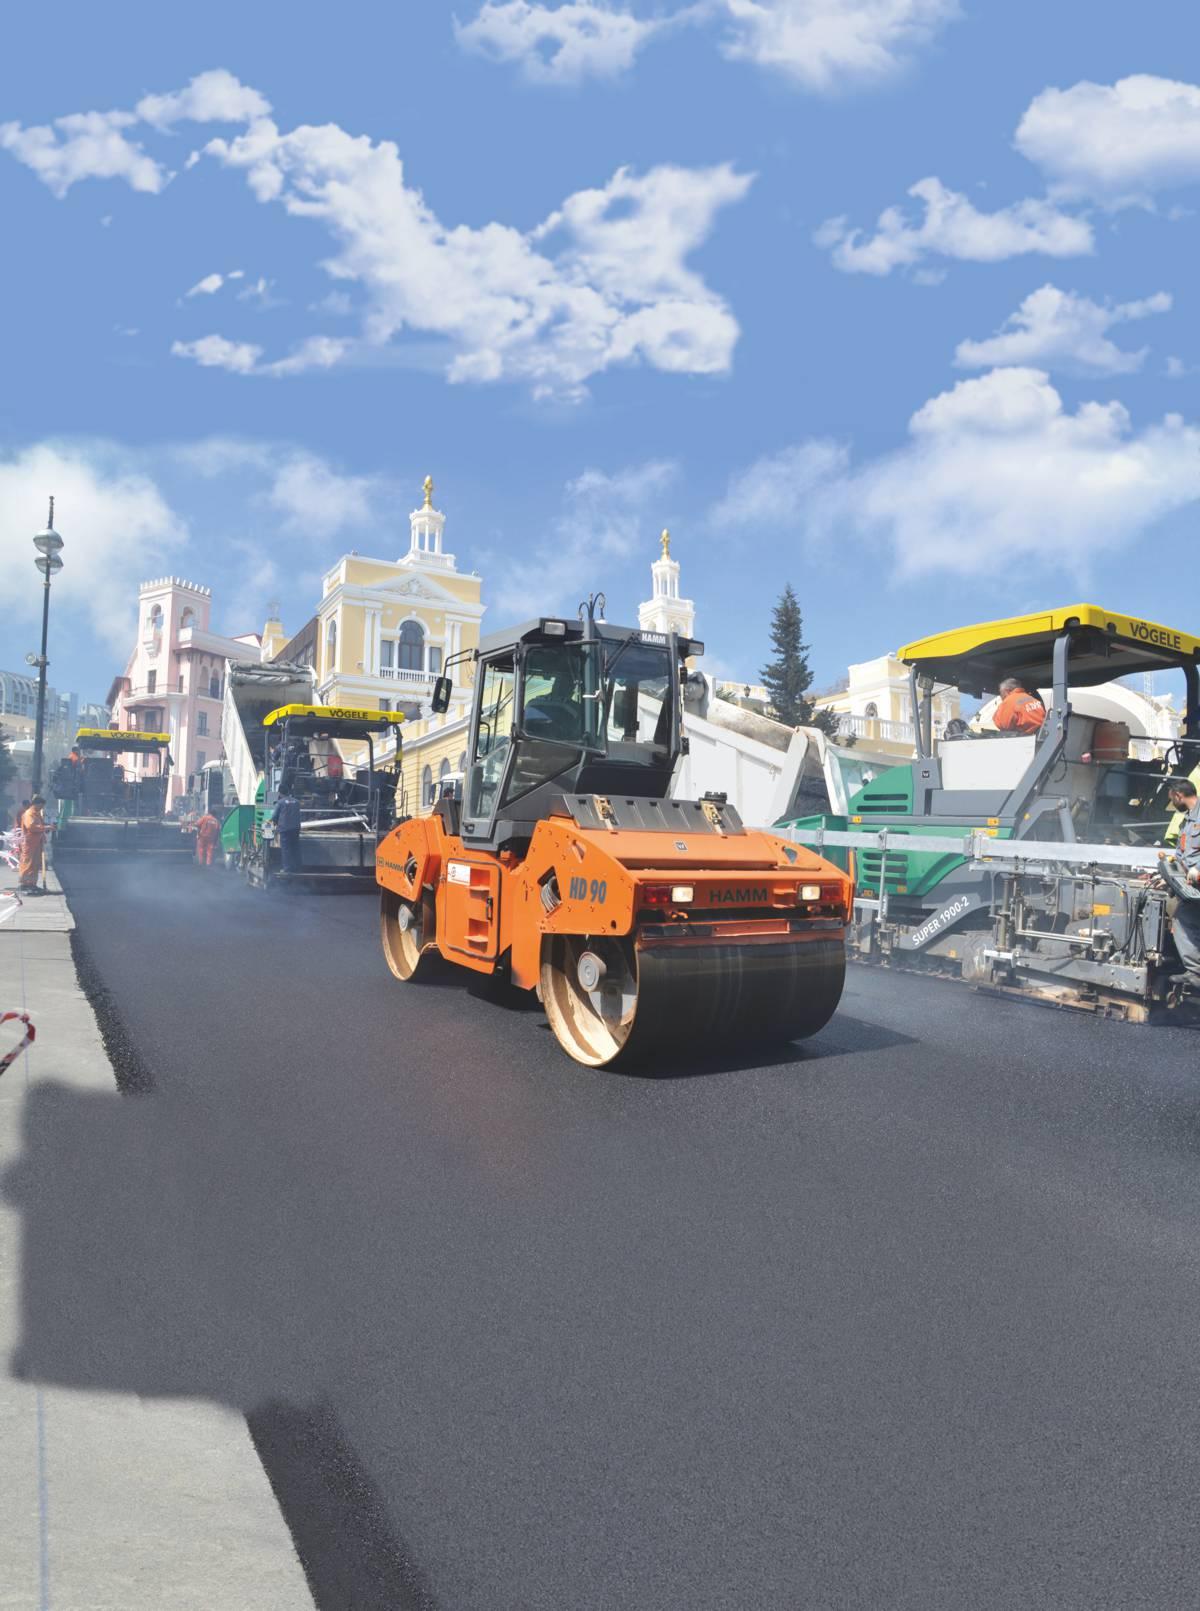 Formula 1 circuit in Baku - Hamm rollers refine demanding street circuit